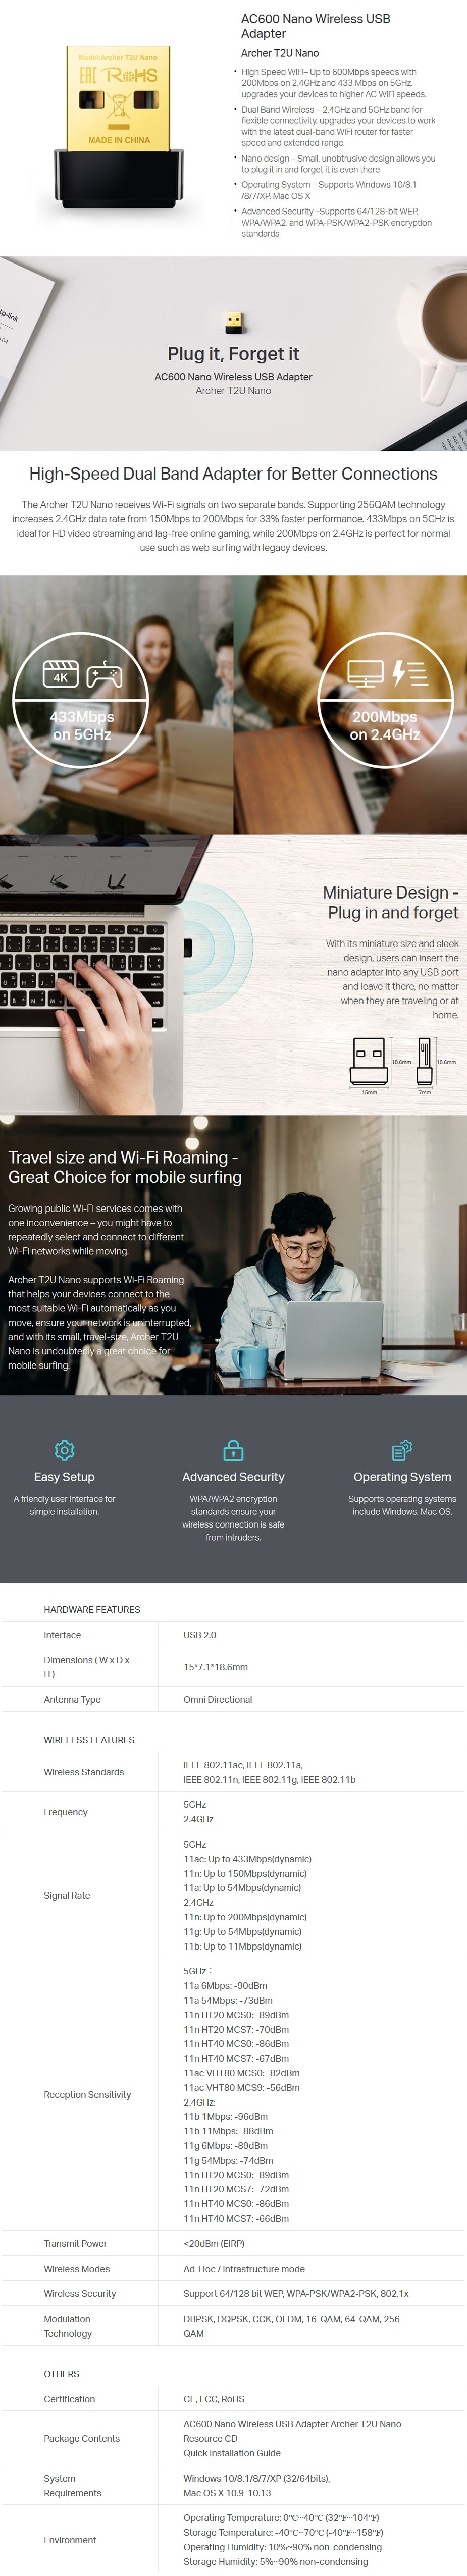 TP-Link Archer T2U AC600 Nano Wireless USB Adapter - Desktop Overview 1